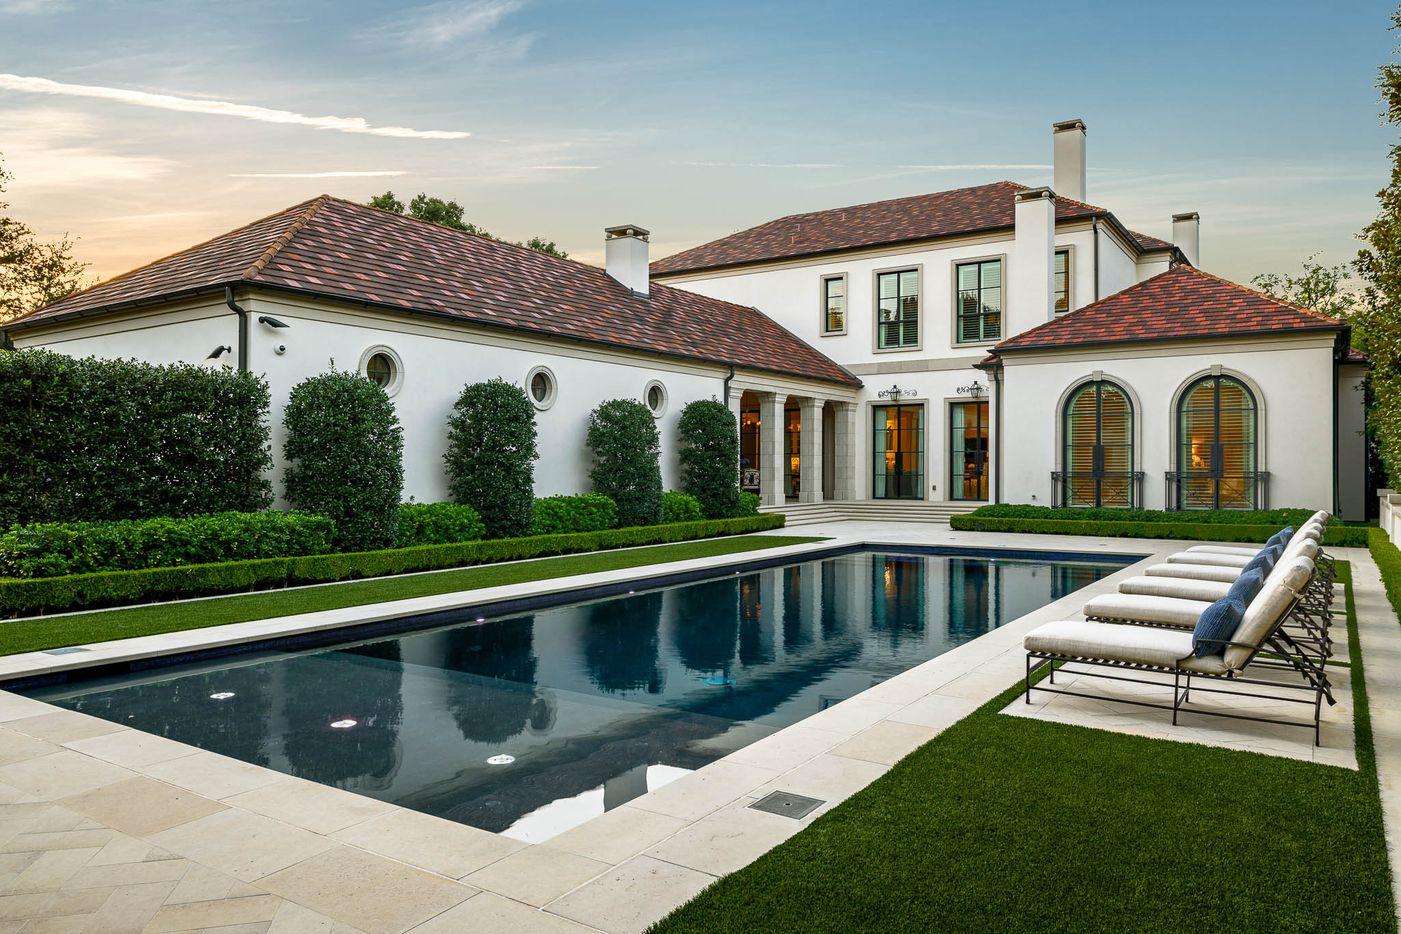 A look at the property at 5522 Falls Road in Dallas.